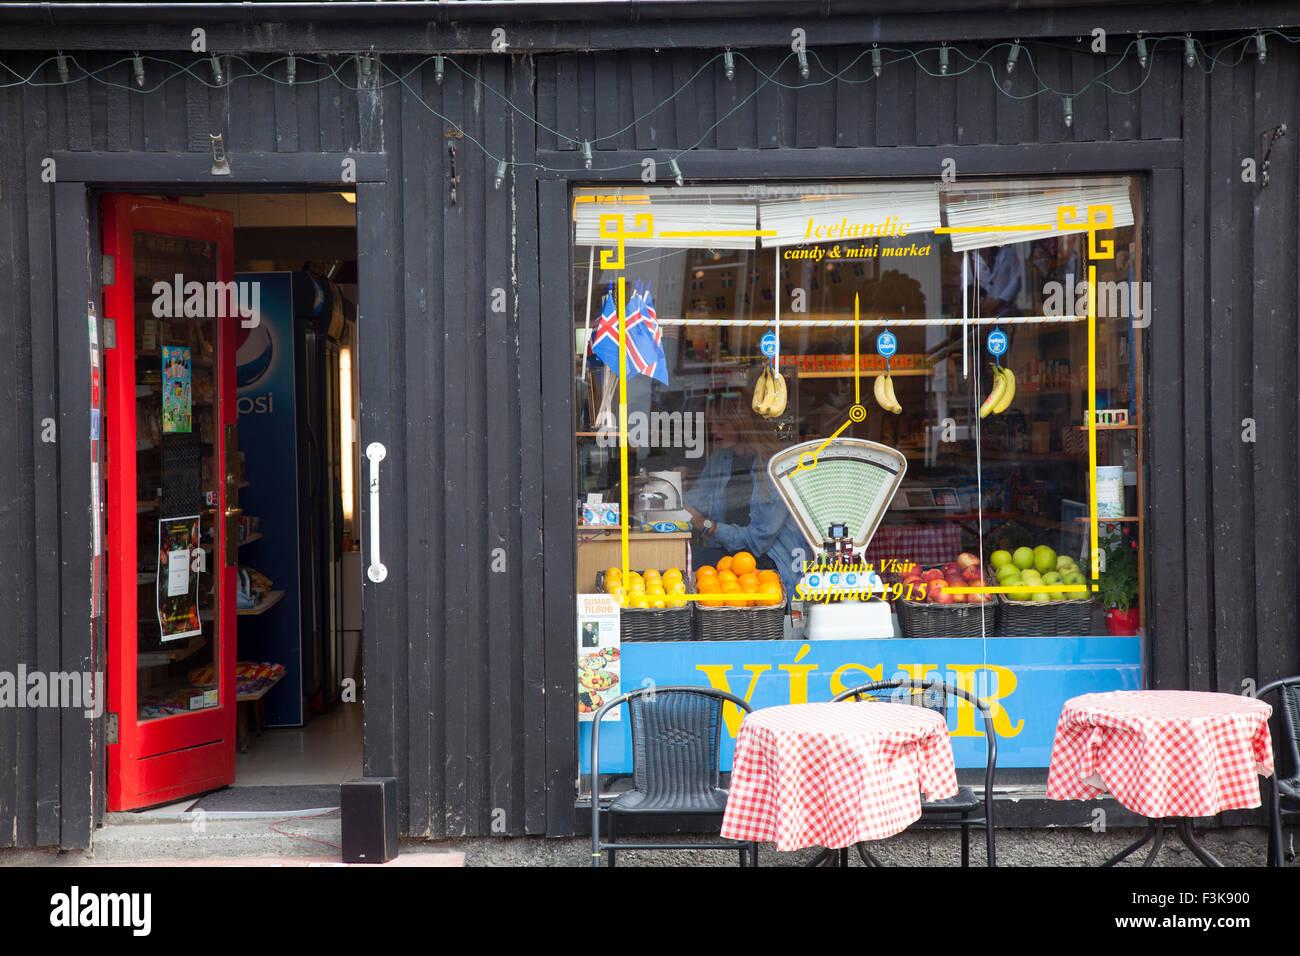 Fachada de la tienda de comestibles, Laugavegur, Reykjavik, Iceland. Imagen De Stock